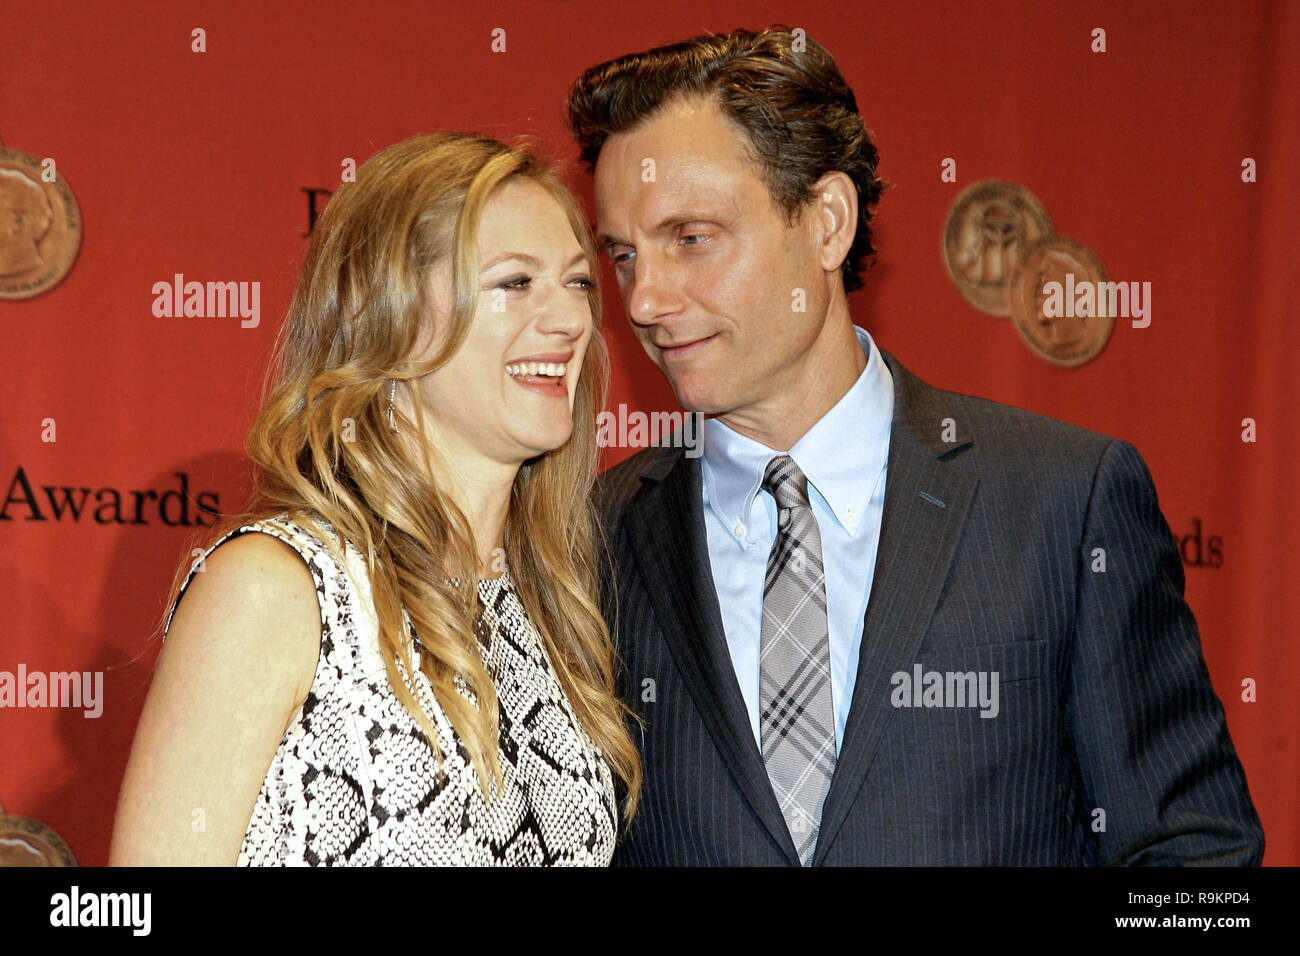 New York, NY / USA - May 19, 2014: Marin Ireland, Tony Goldwyn at The 73rd Annual George Foster Peabody Awards at The Waldorf=Astoria. - Stock Image